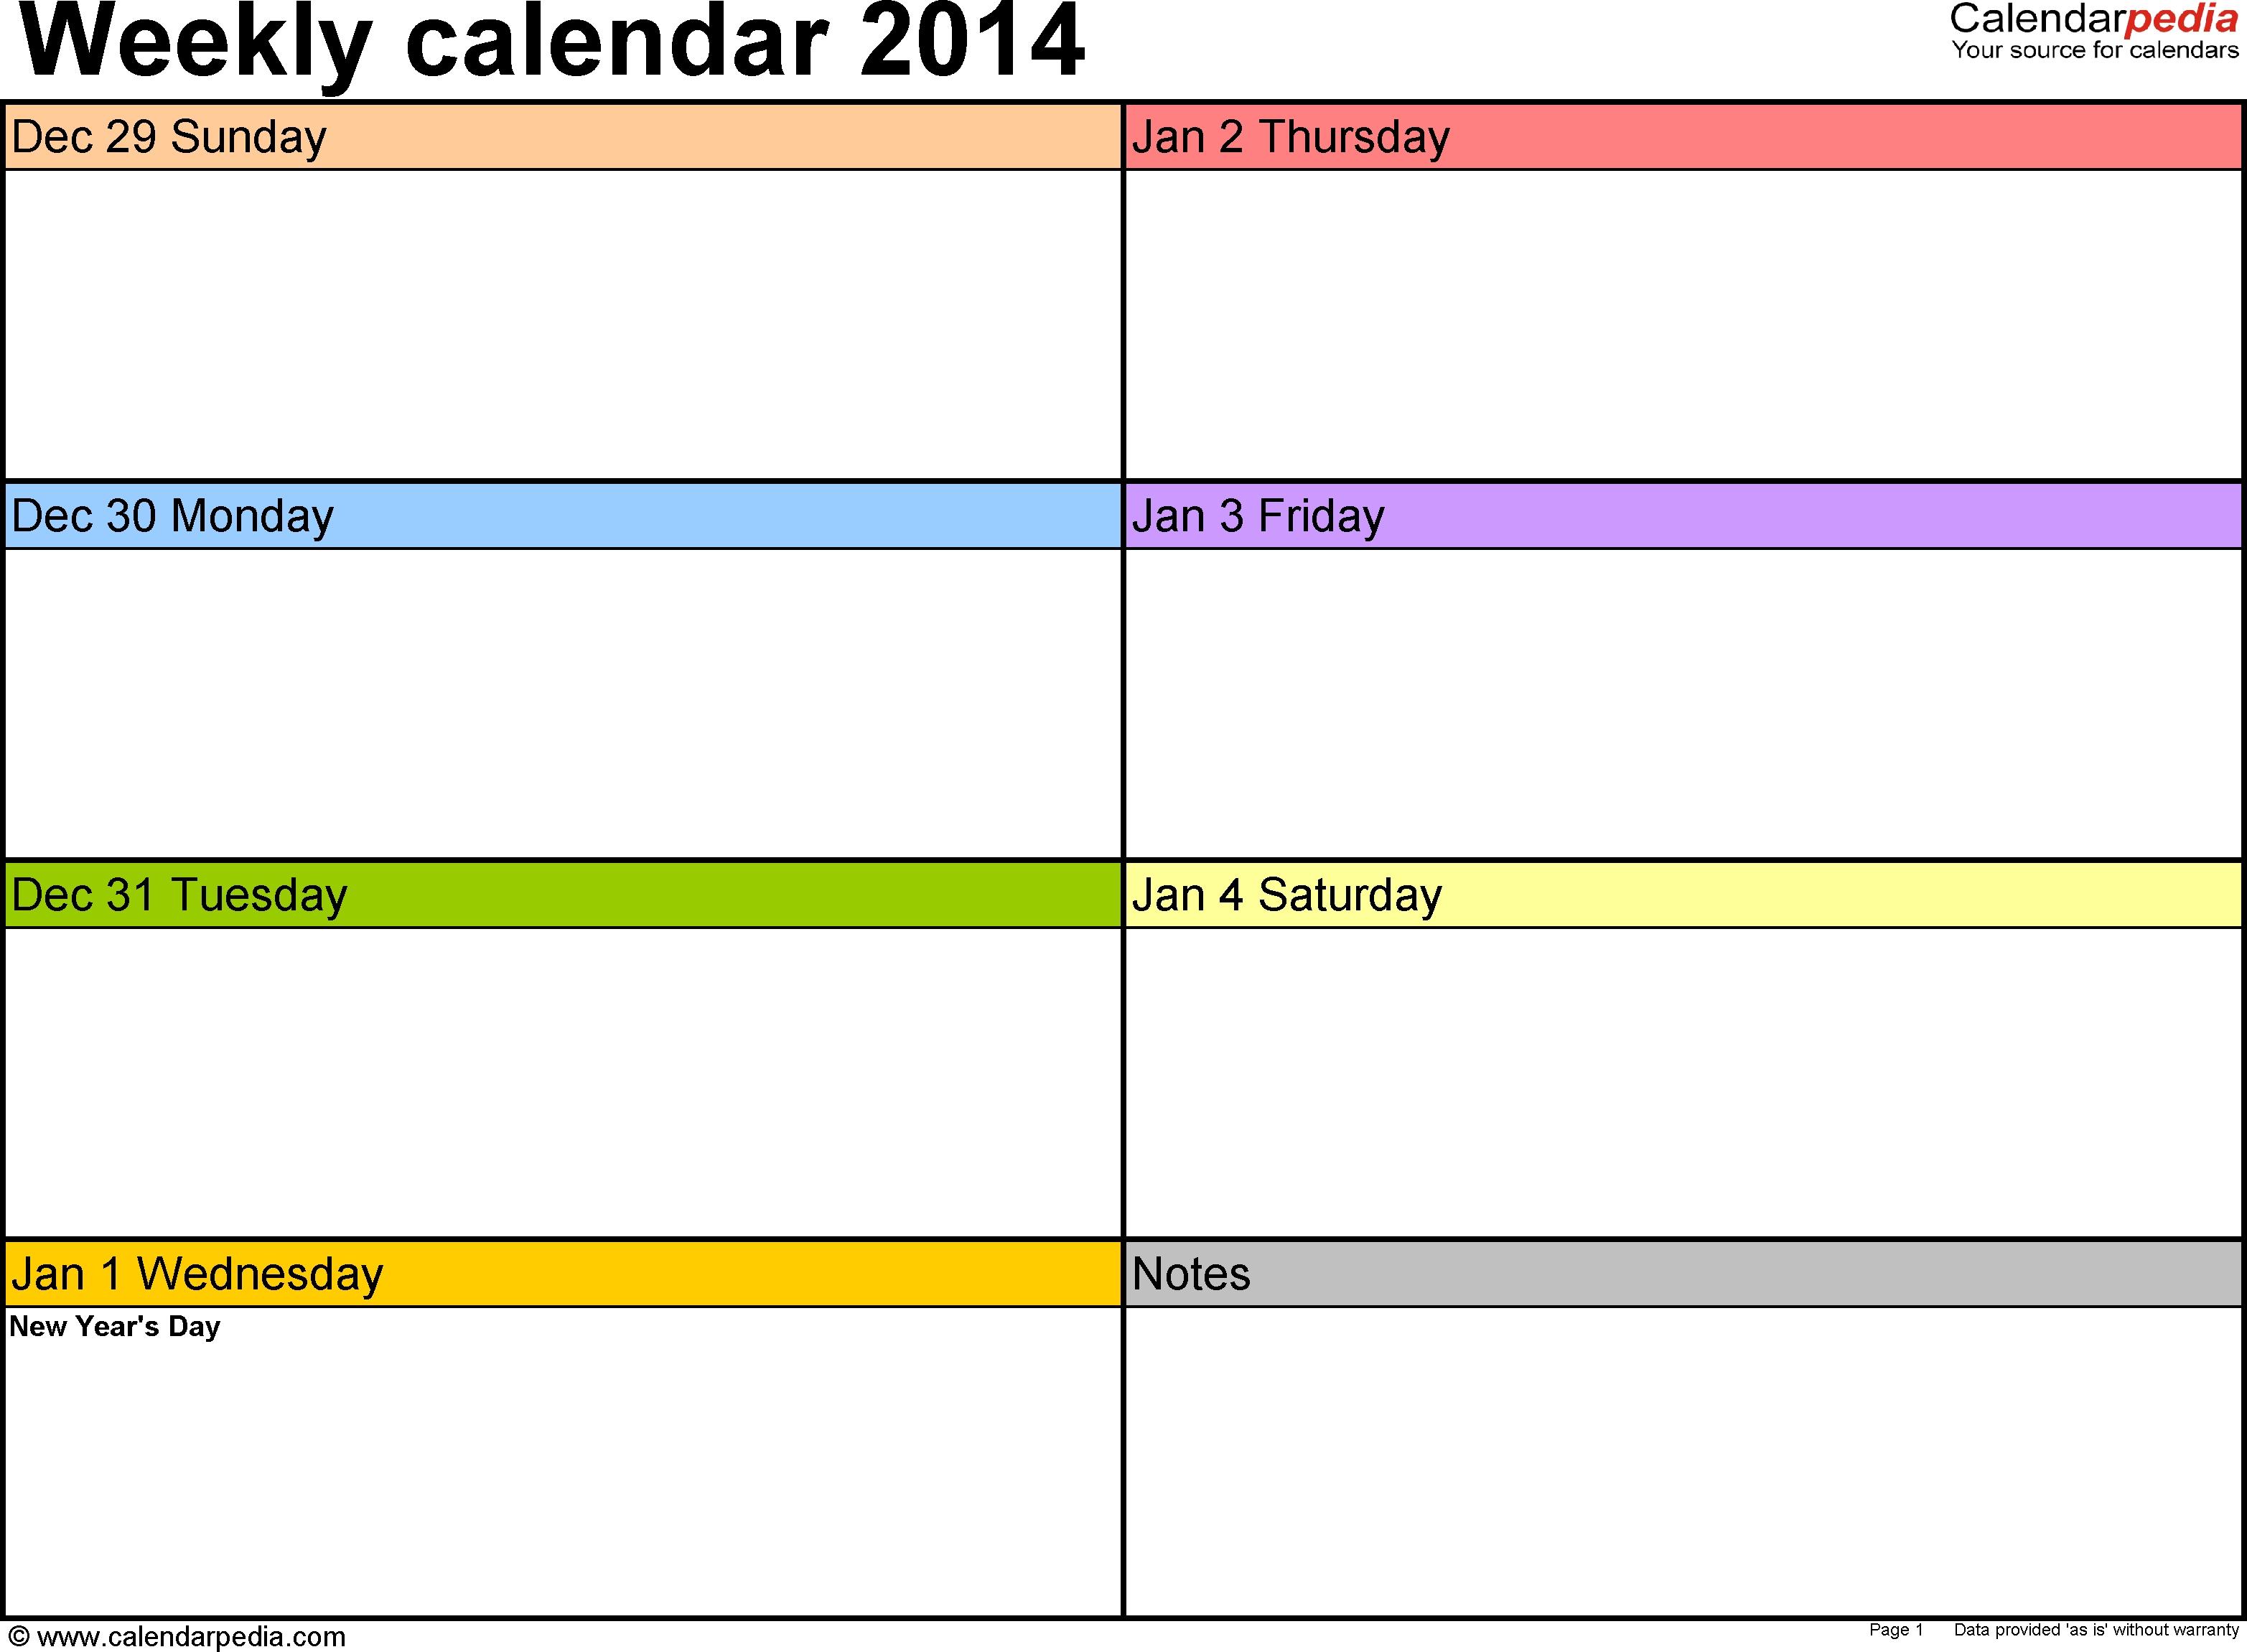 Weekly Calendar 2014 For Pdf - 4 Free Printable Templates throughout Blank 4 Week Calendar Printable